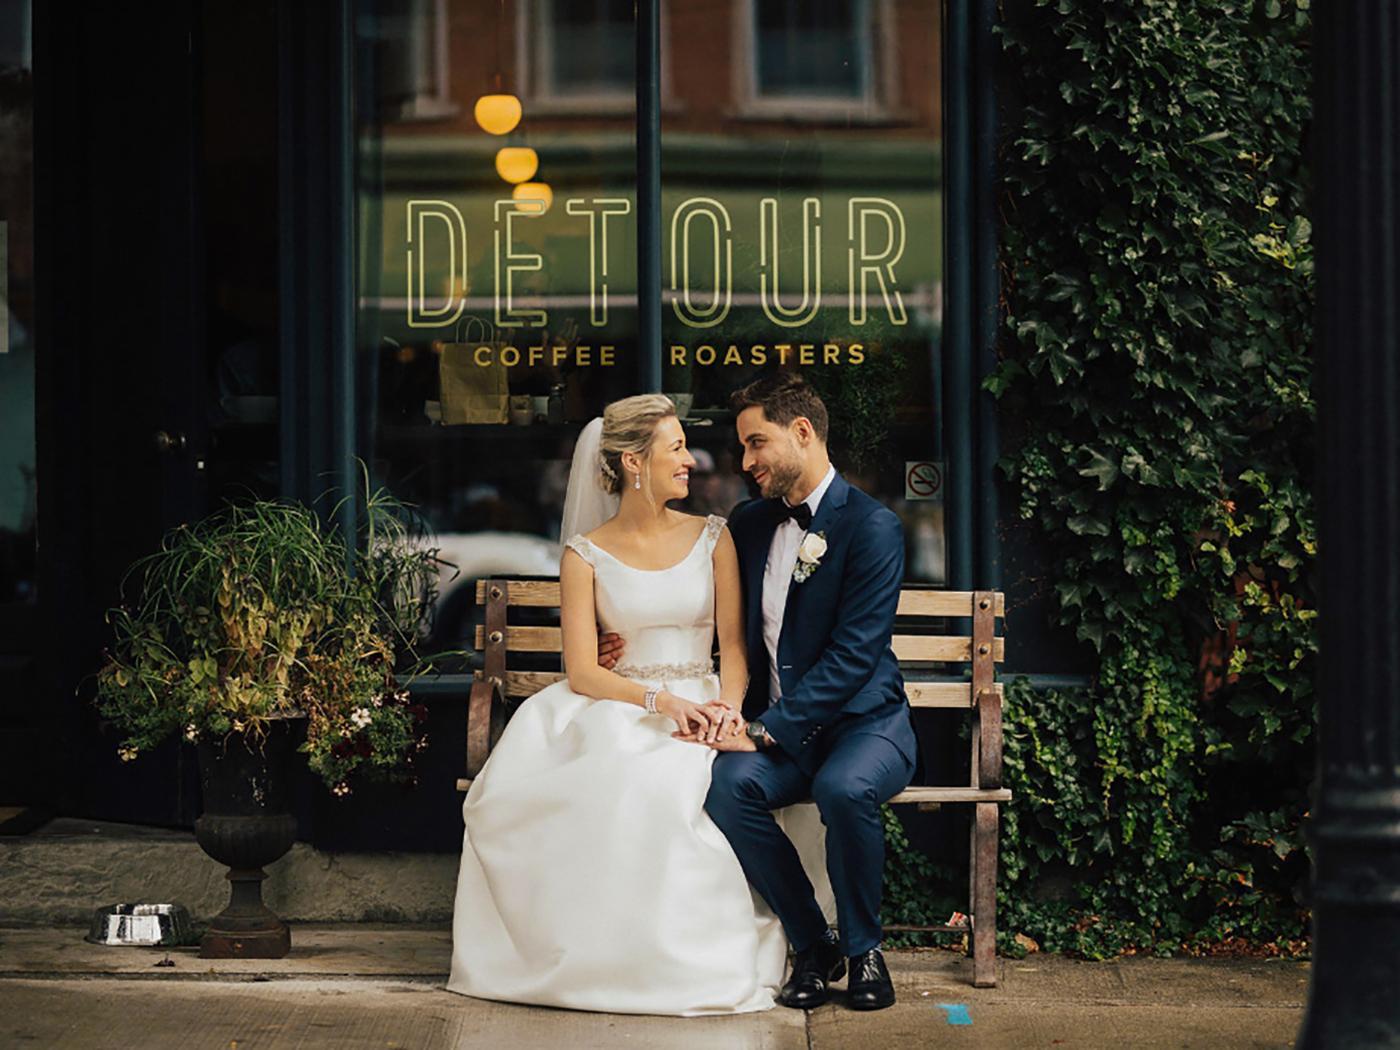 Aaron & Grace's Wedding Dundas Ontario Wedding Videography Ancaster Aidan Hennebry Hush Hush Wedding Films Photography & Film Hamilton Outdoor Elegant Downtown Toronto Niagara Elora Mill.jpg